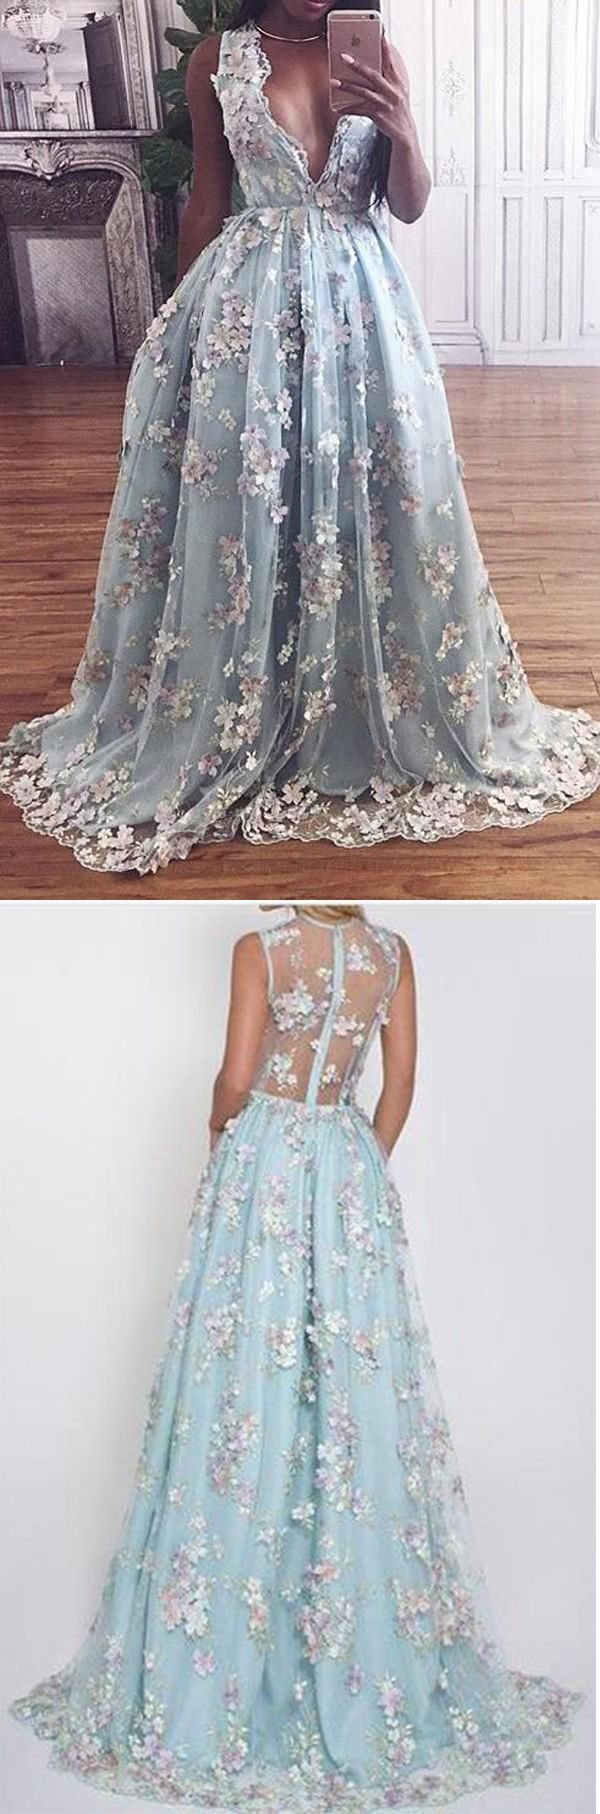 Floral lace deep vneck a line light sky blue princess prom dress